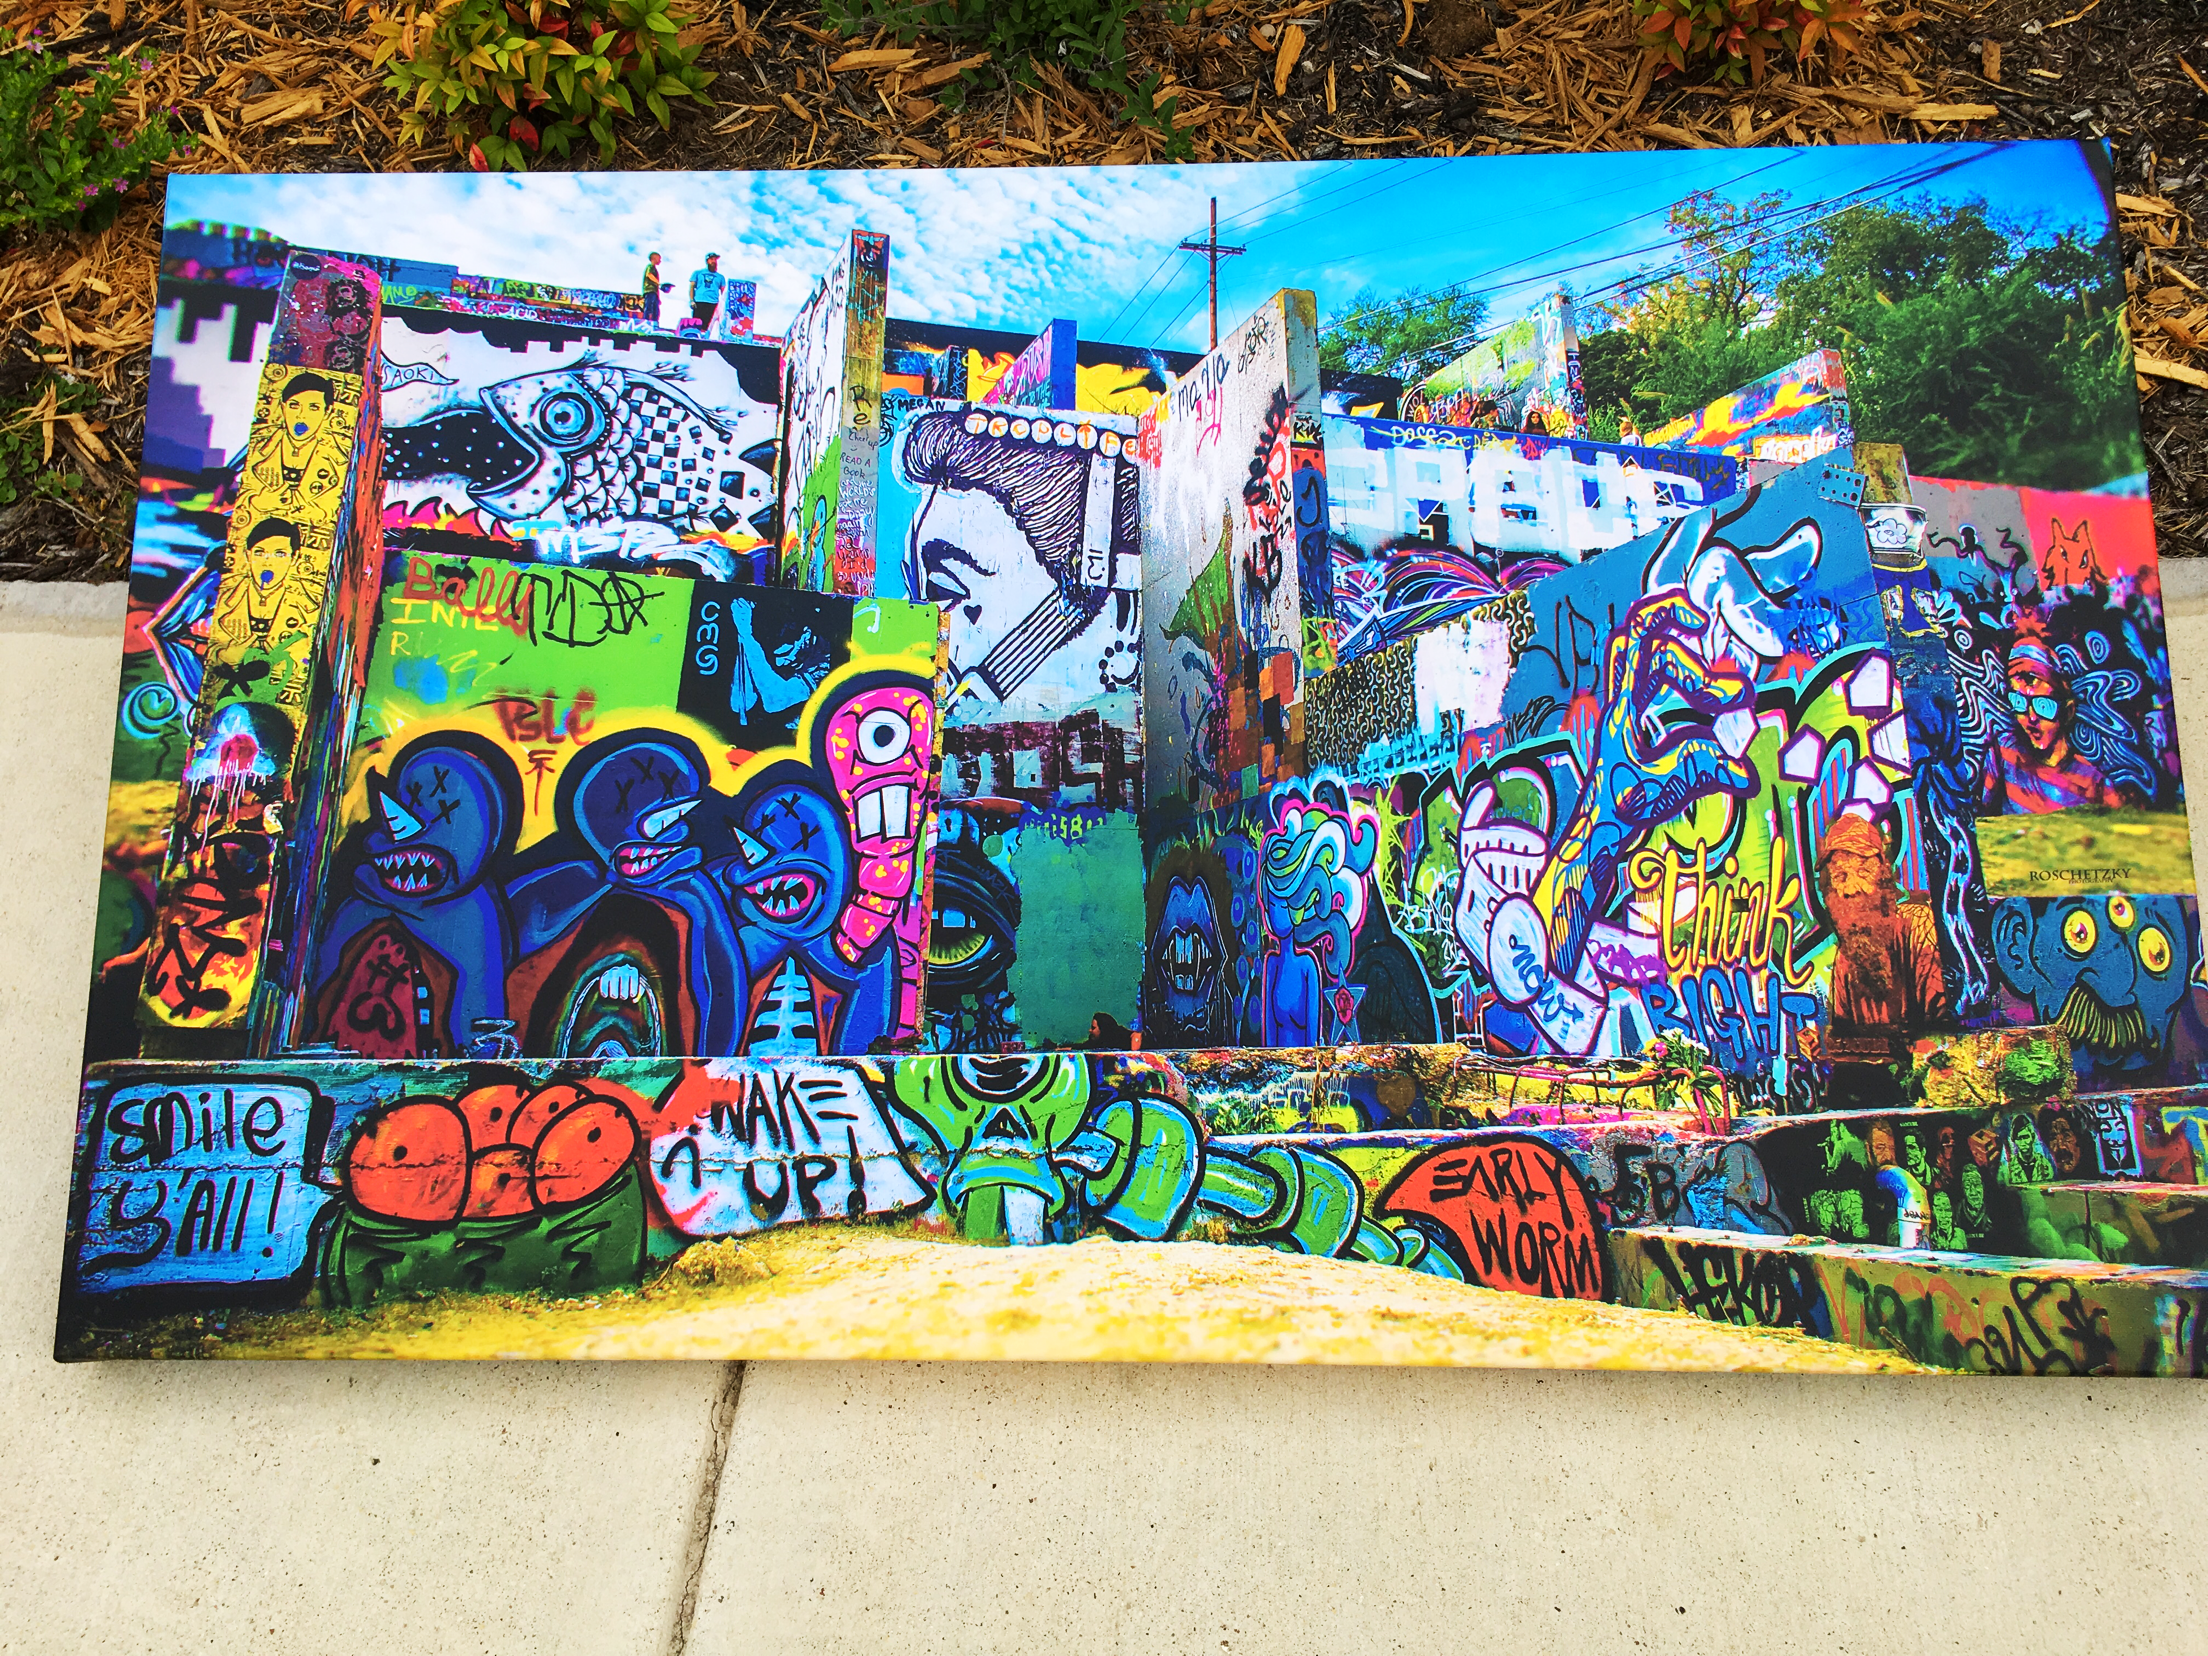 Fine Arts Photograhy At Austin Graffiti Wall Hope Outdoor Art Galery